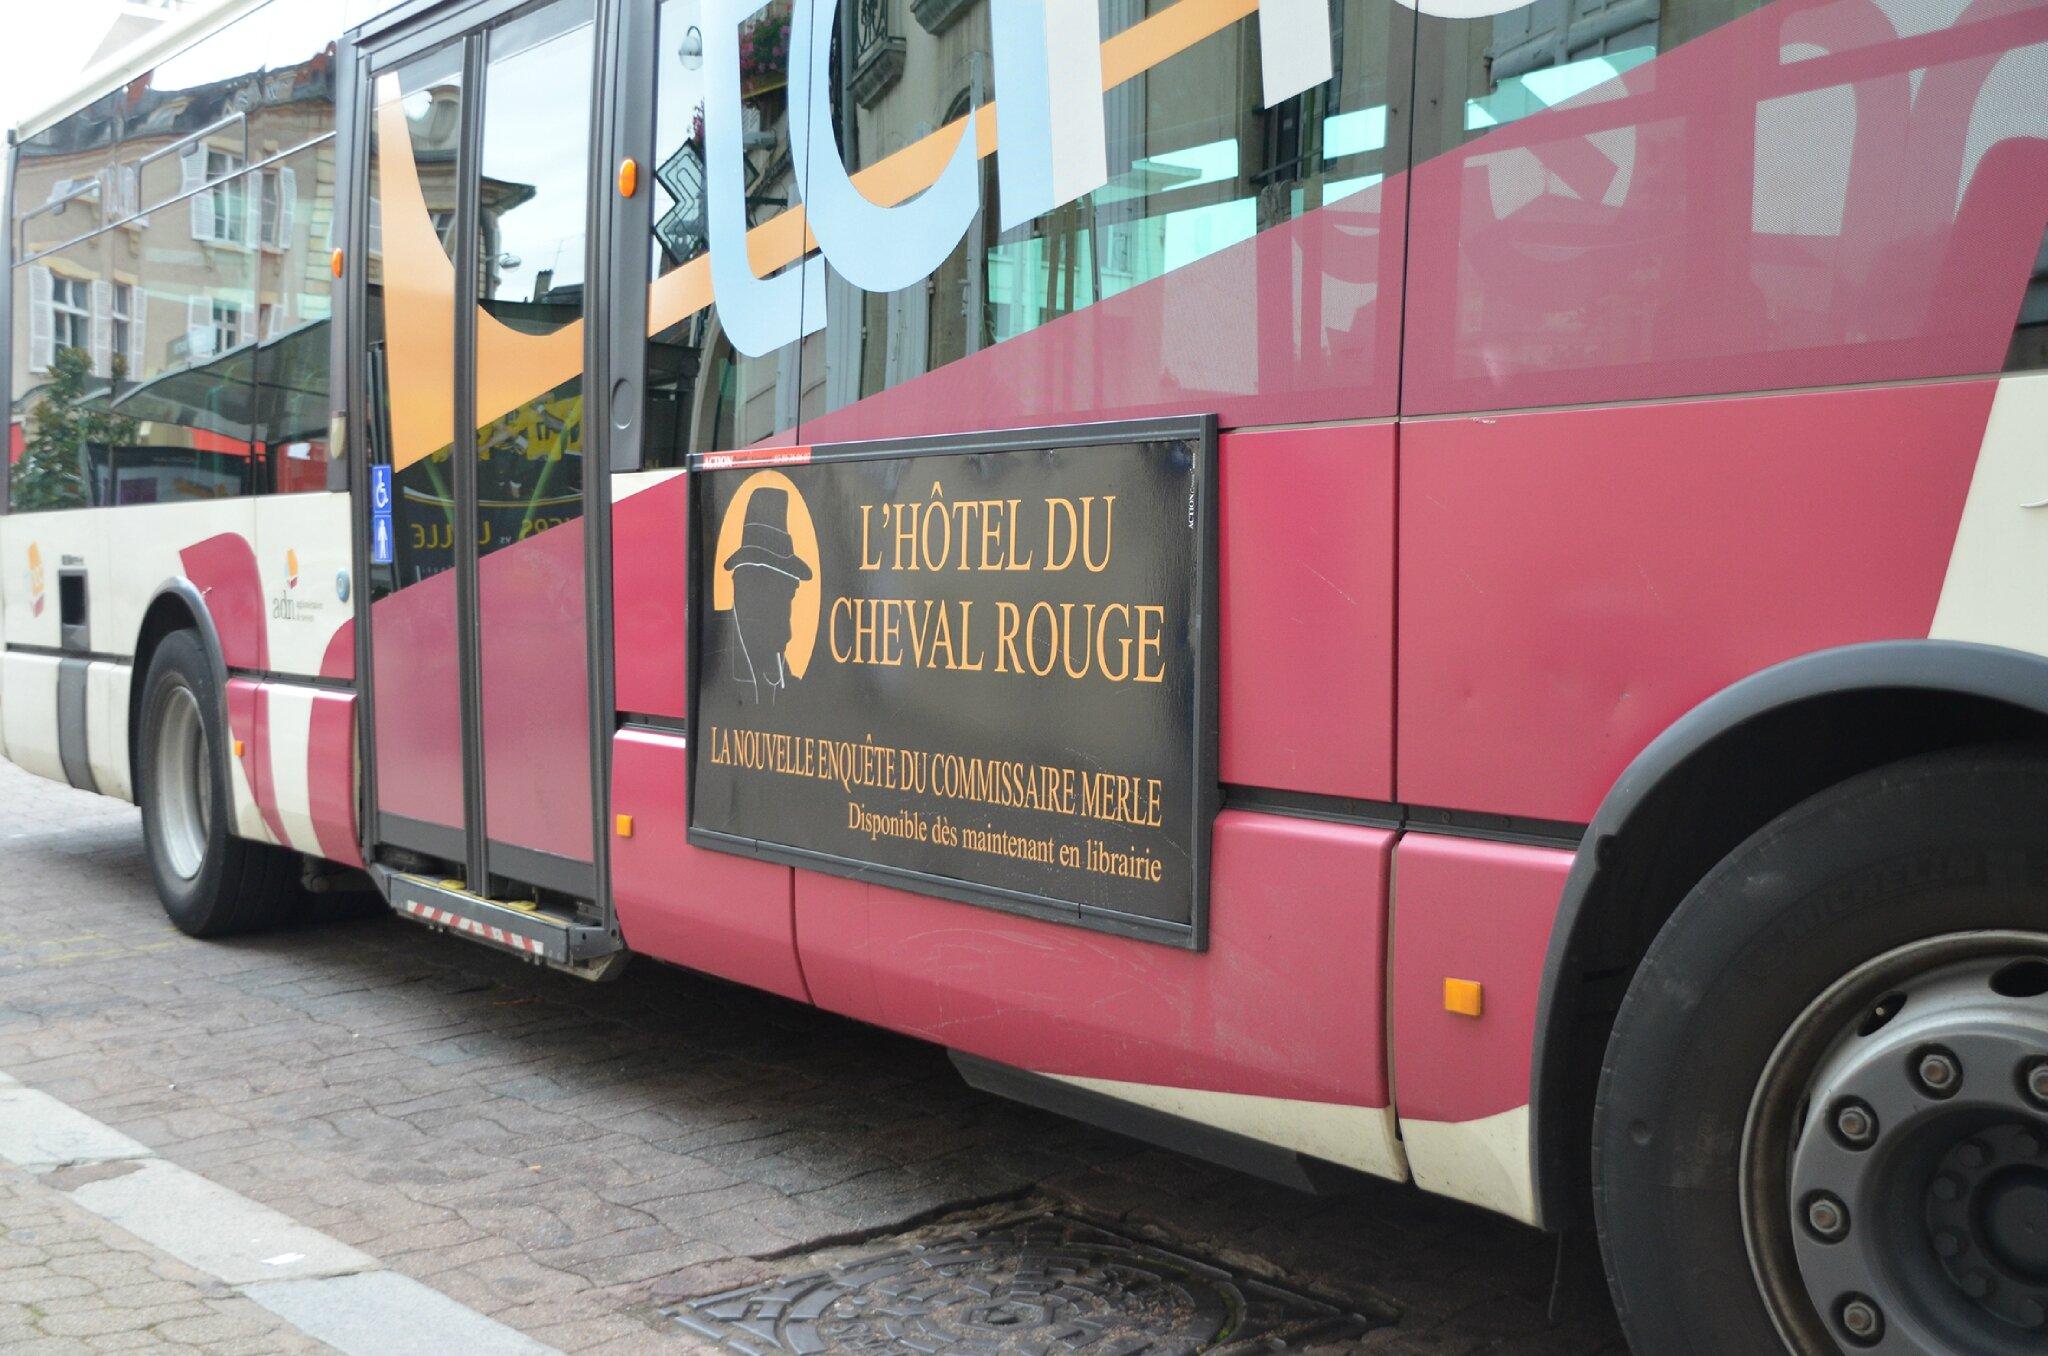 L'Hotel du Cheval Rouge 2